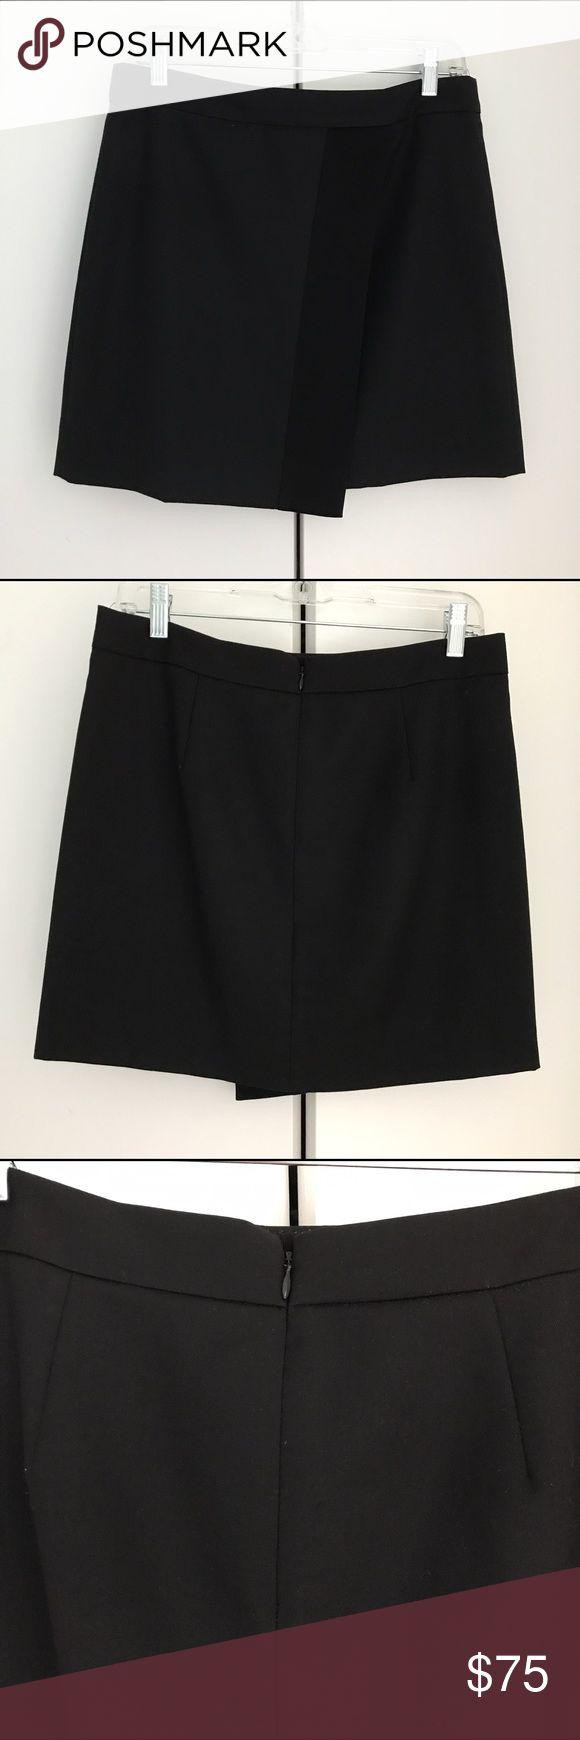 J. Crew Origami skirt in tux stripe Black J. Crew Origami skirt in tux stripe. Sits at waist. Hidden back Zipper. Fully Lined. 16 1/2 inches long. Falls above knee. 50% polyester, 50% wool; Tuxedo stripe trim 82% triacetate, 18% polyester; Lining 100% polyester. J. Crew Skirts